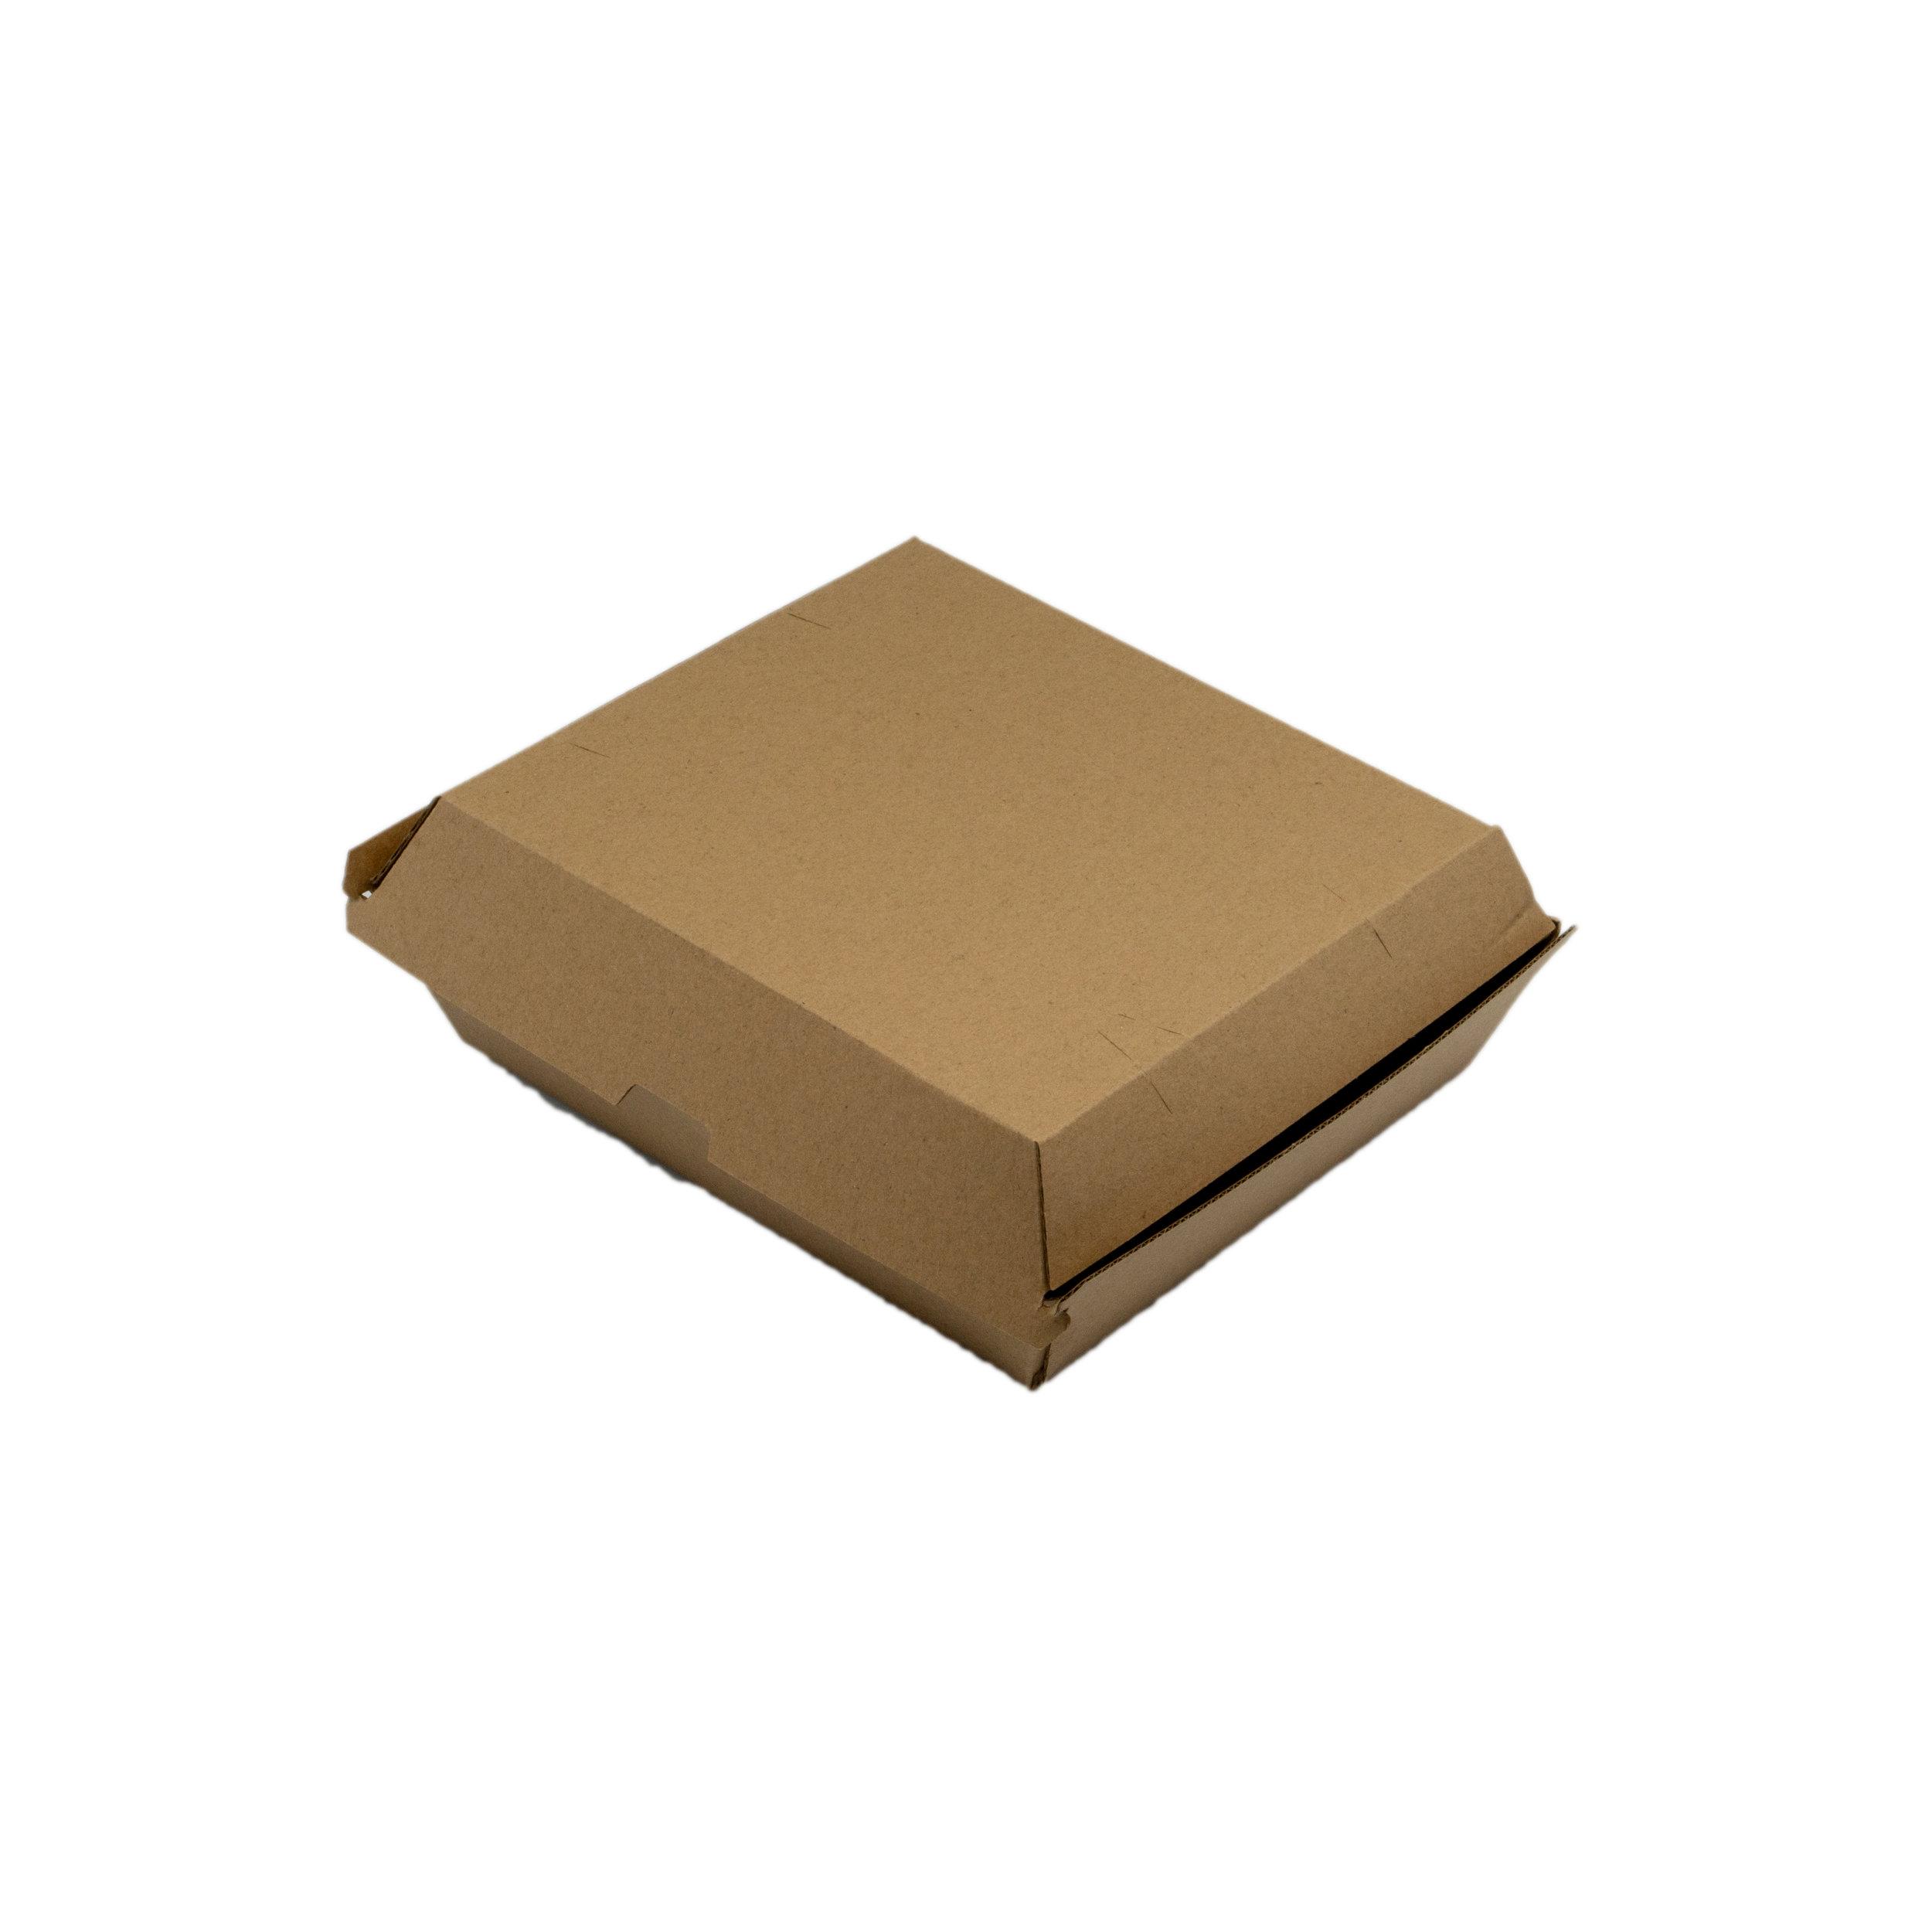 iK-EBEDB Dinner Box   180x160x80mm  2x75 slv  150pcs